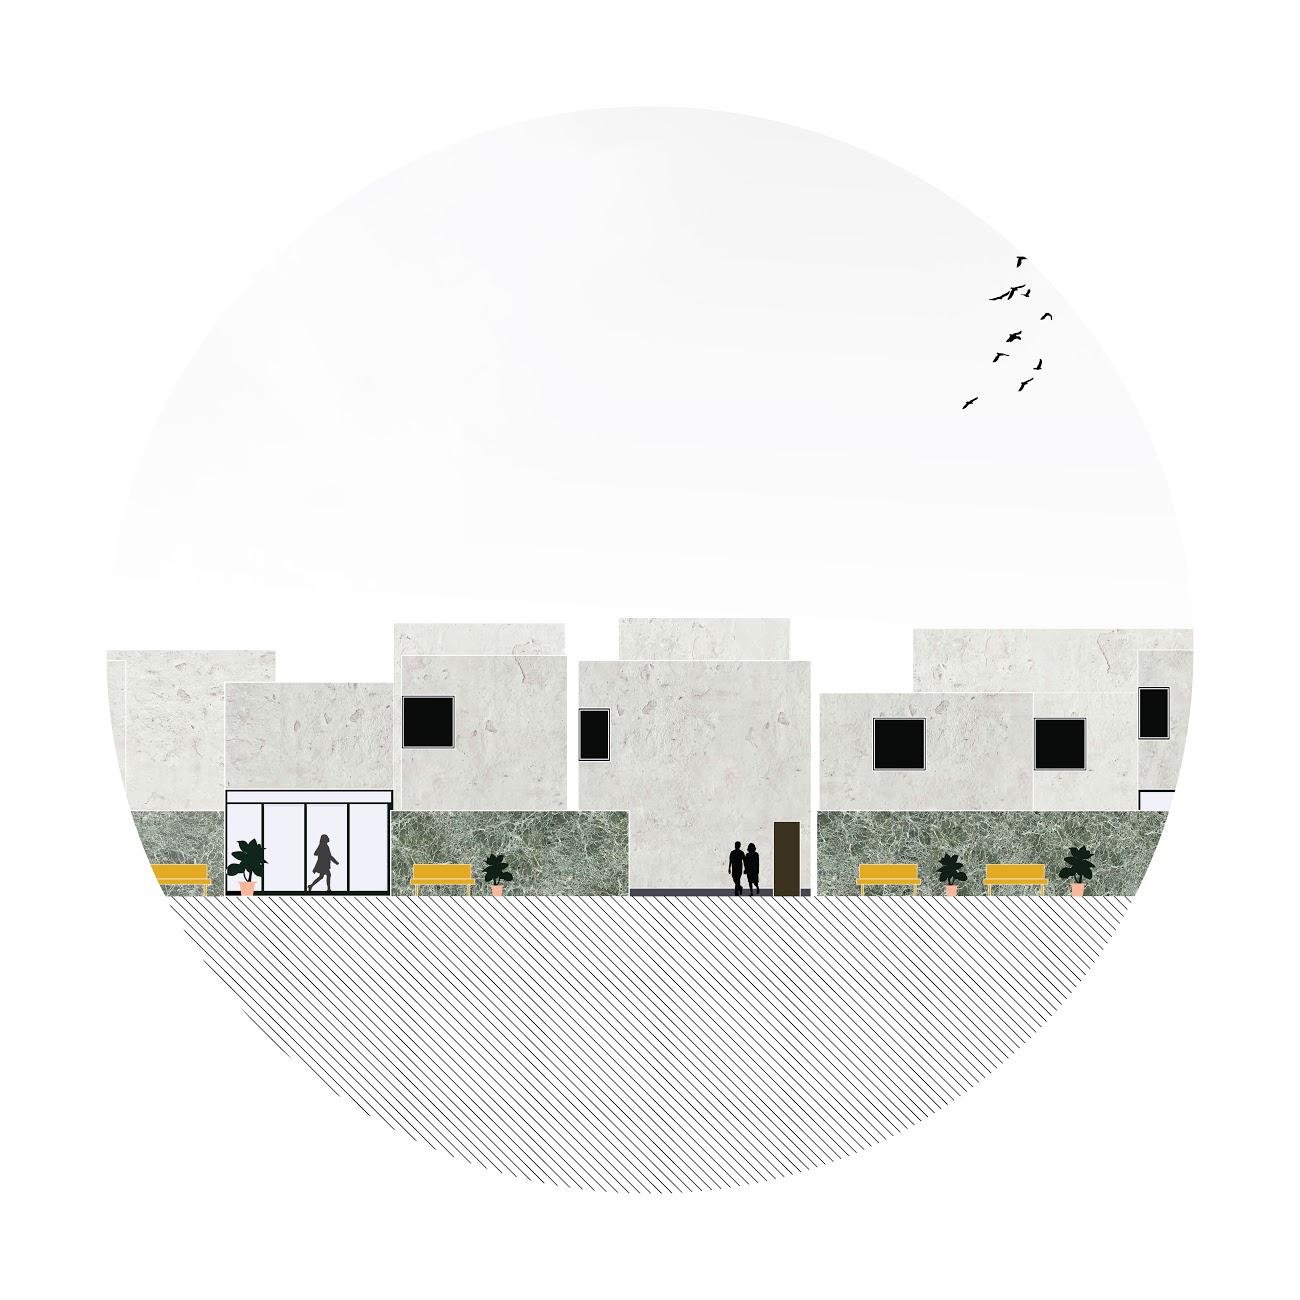 Anna Budzinskaya_Pasadena Housing_Elevation-1_Cal Poly Pomona